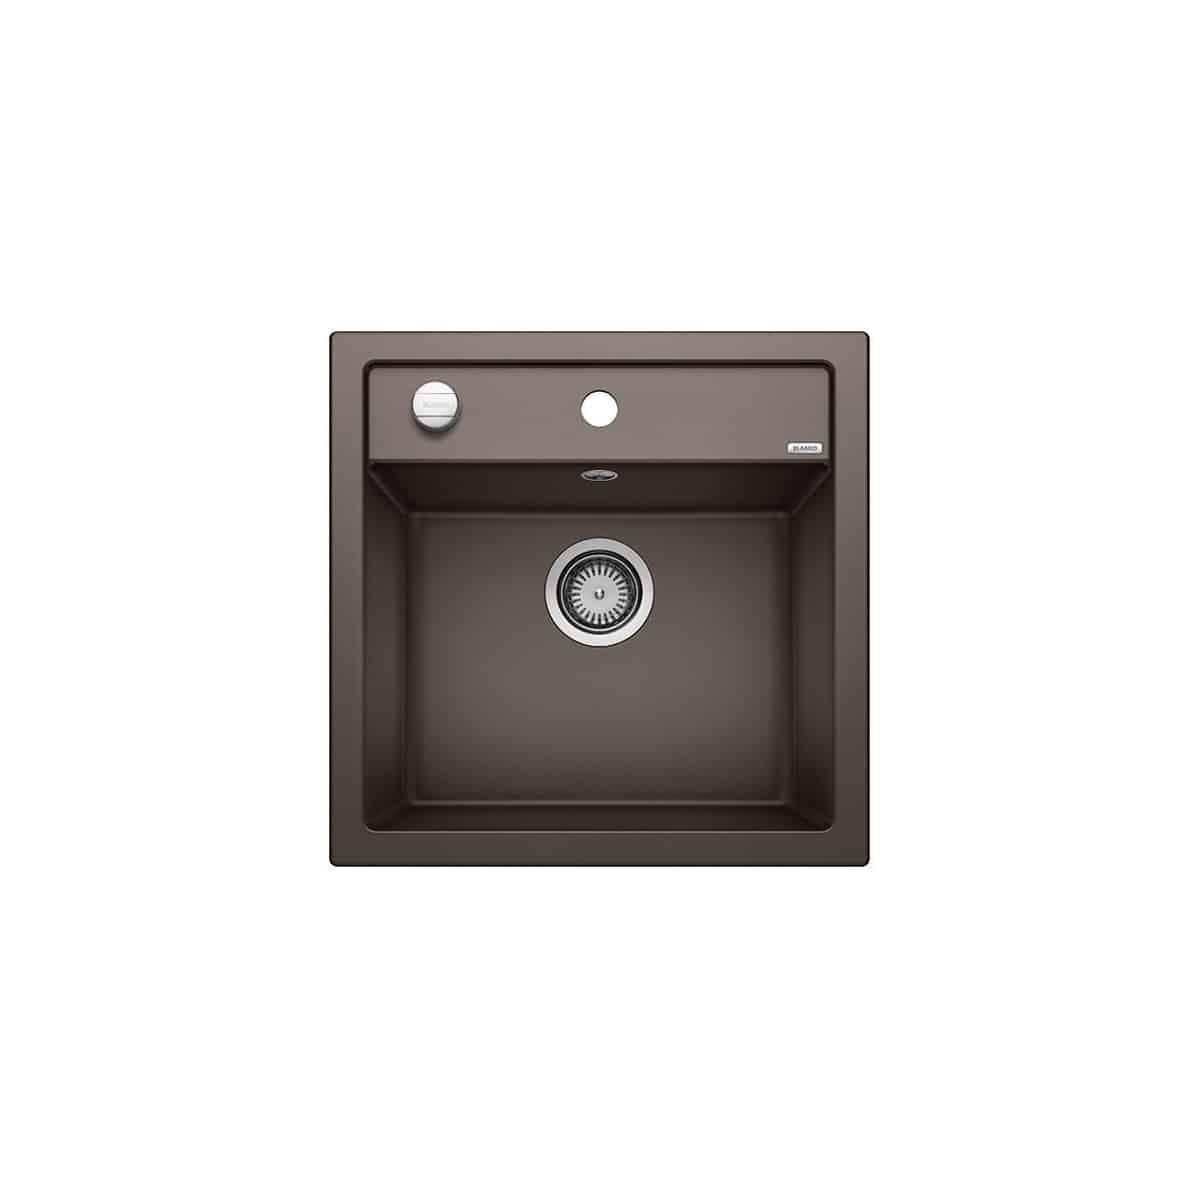 blanco dalago 5 silgranit eviers direct evier. Black Bedroom Furniture Sets. Home Design Ideas